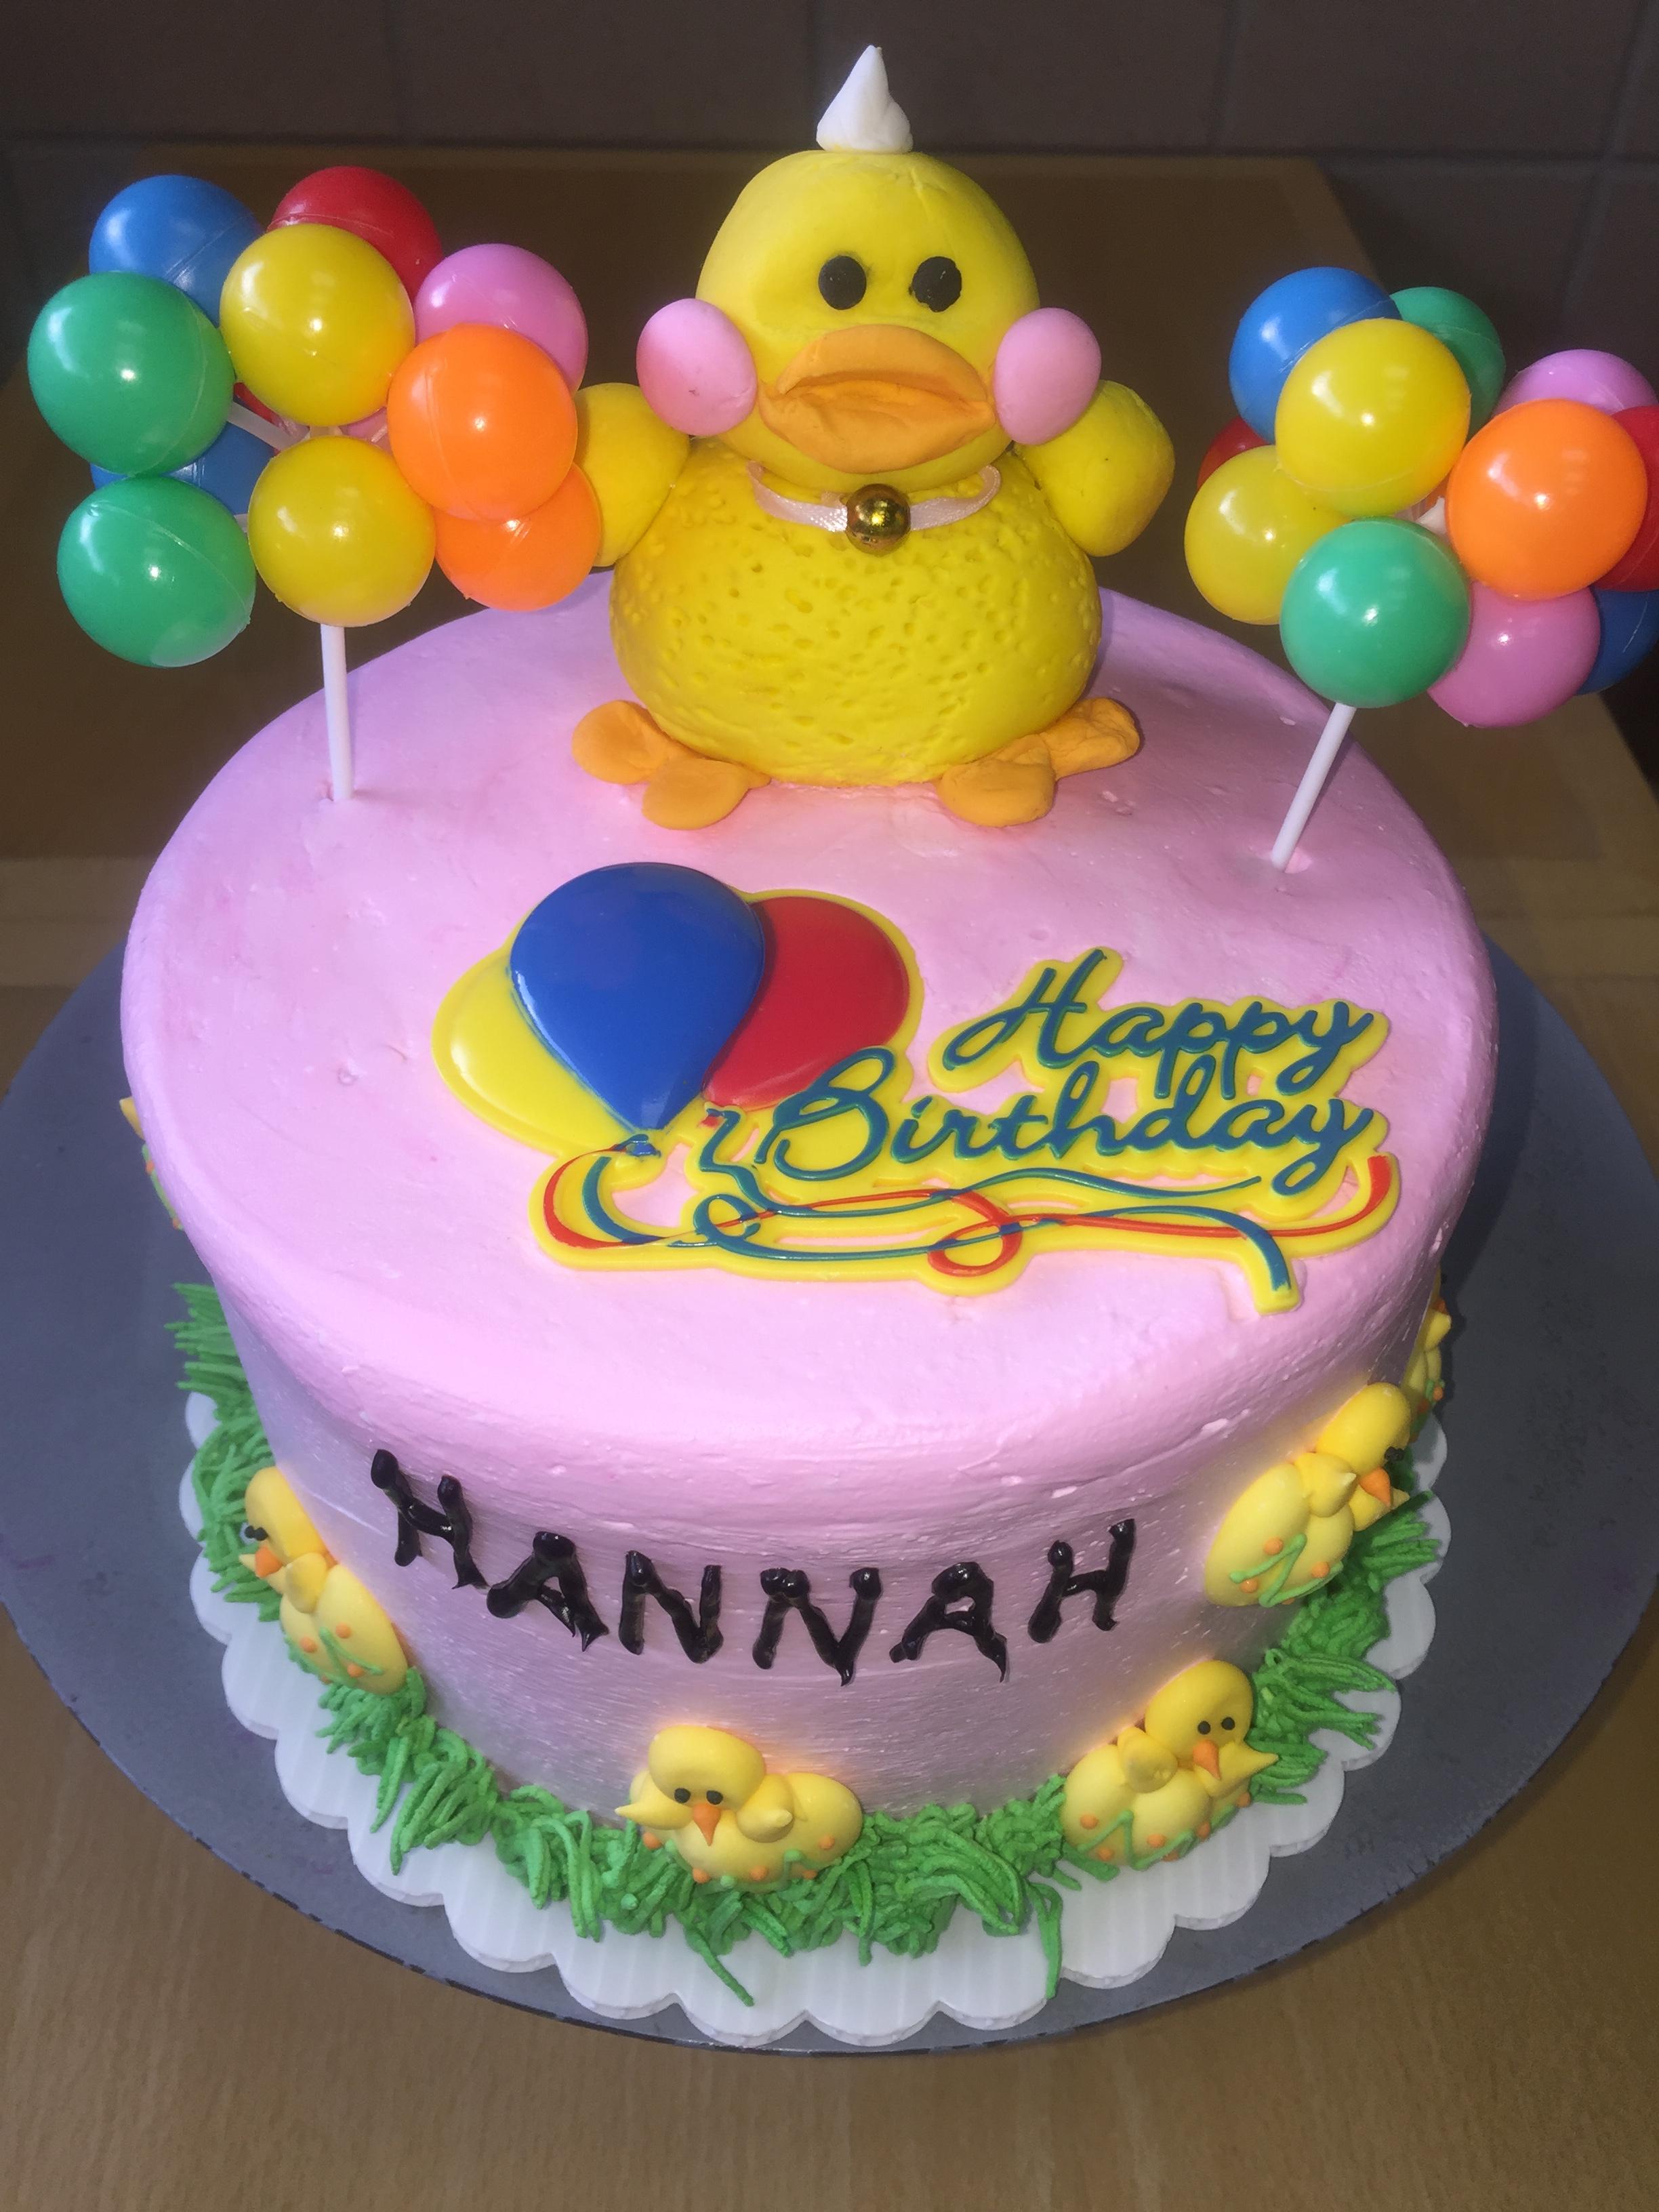 Wondrous Rubber Ducky Birthday Cake Wild Berries Bakery And Cafe Funny Birthday Cards Online Inifodamsfinfo